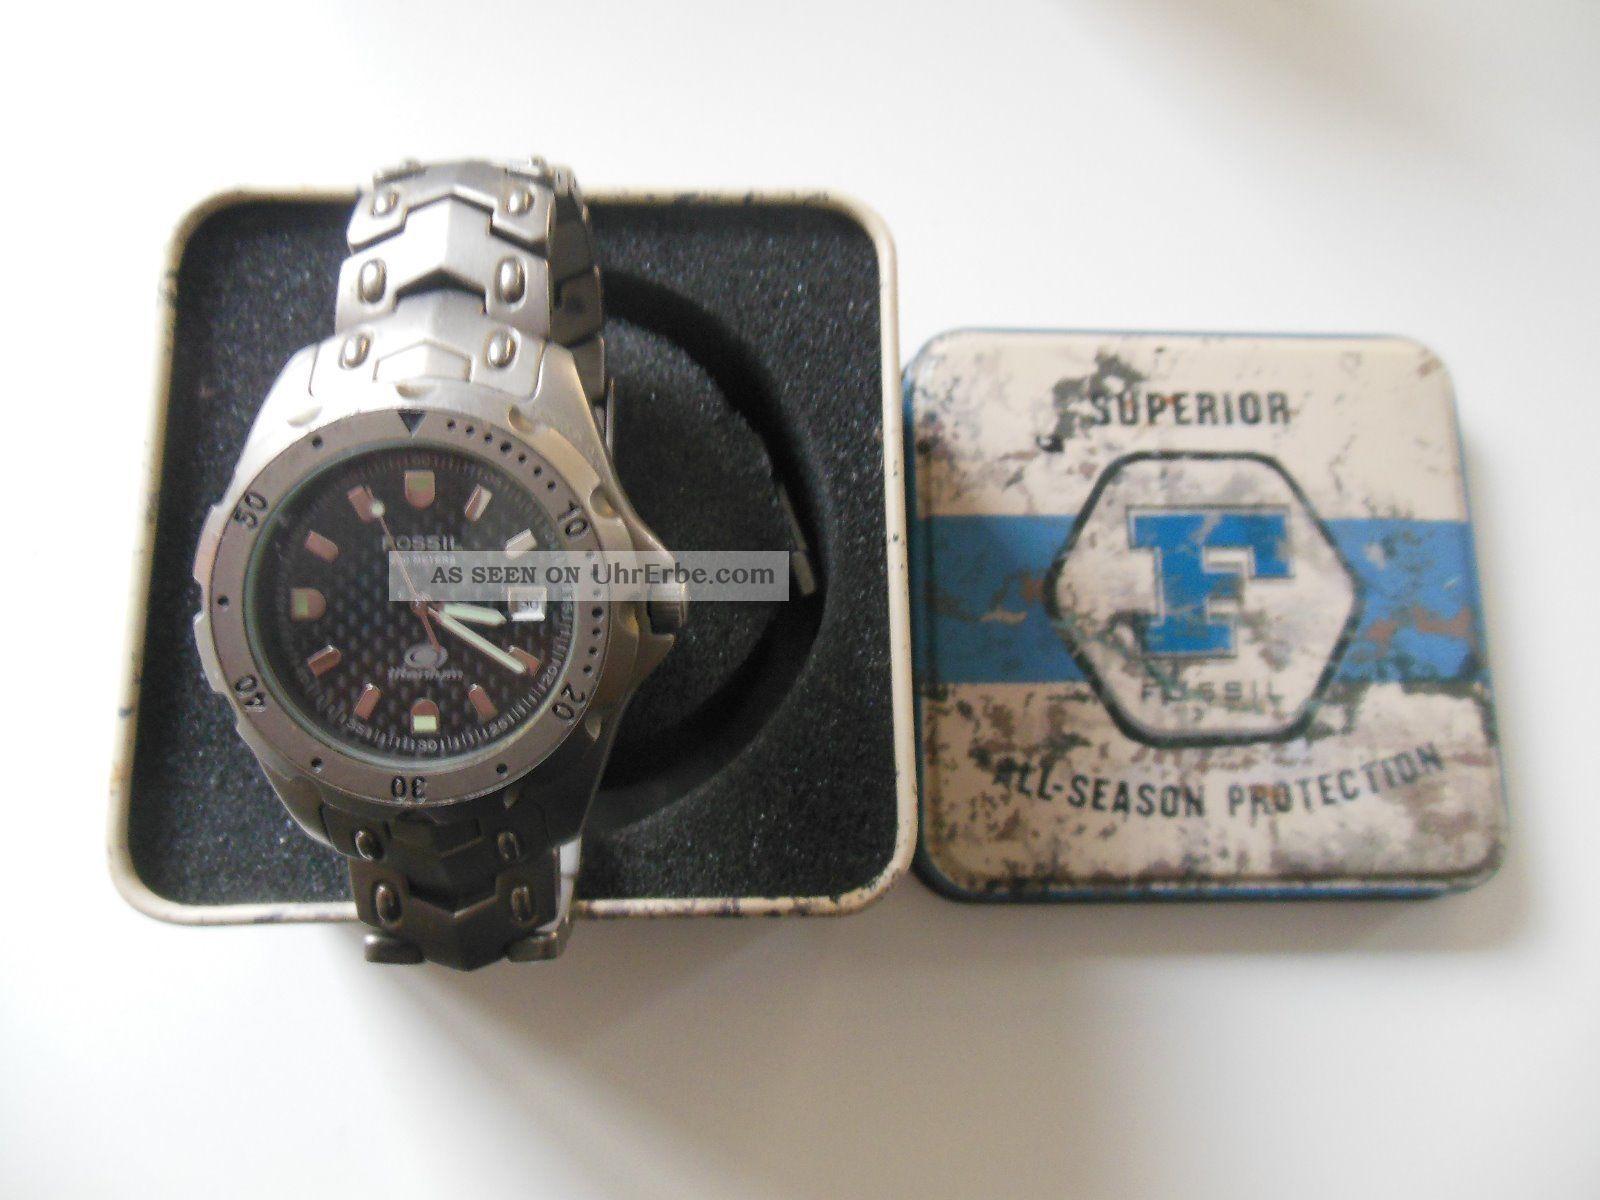 Fossil Armbanduhr Herrenarmbanduhr Titanium Ti - 5019 Armbanduhren Bild